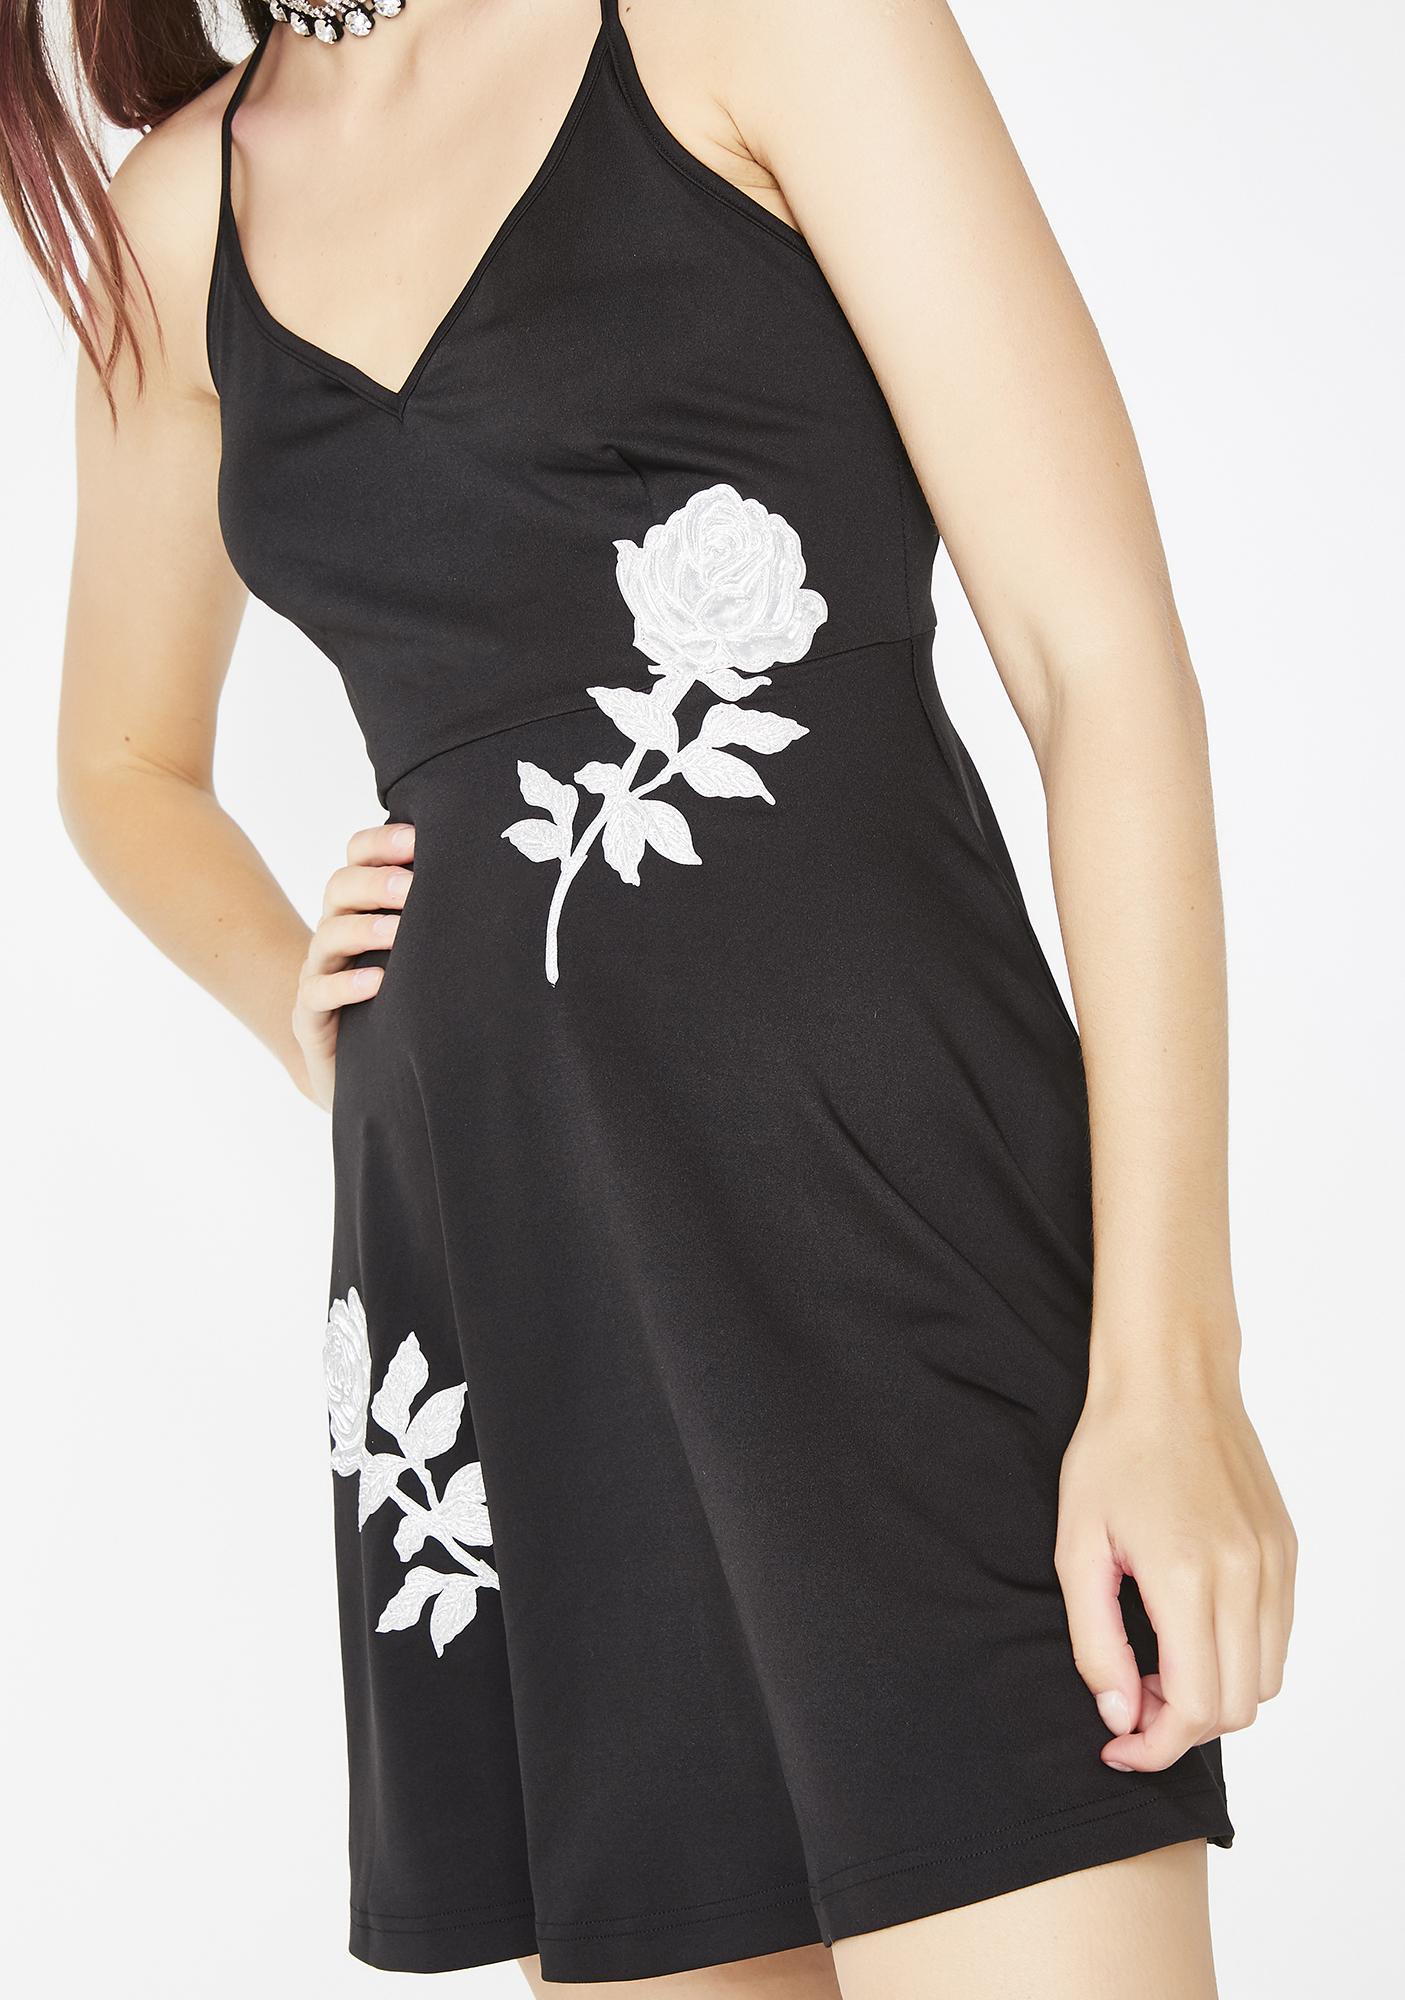 No Dress Silver Rose Black Dress